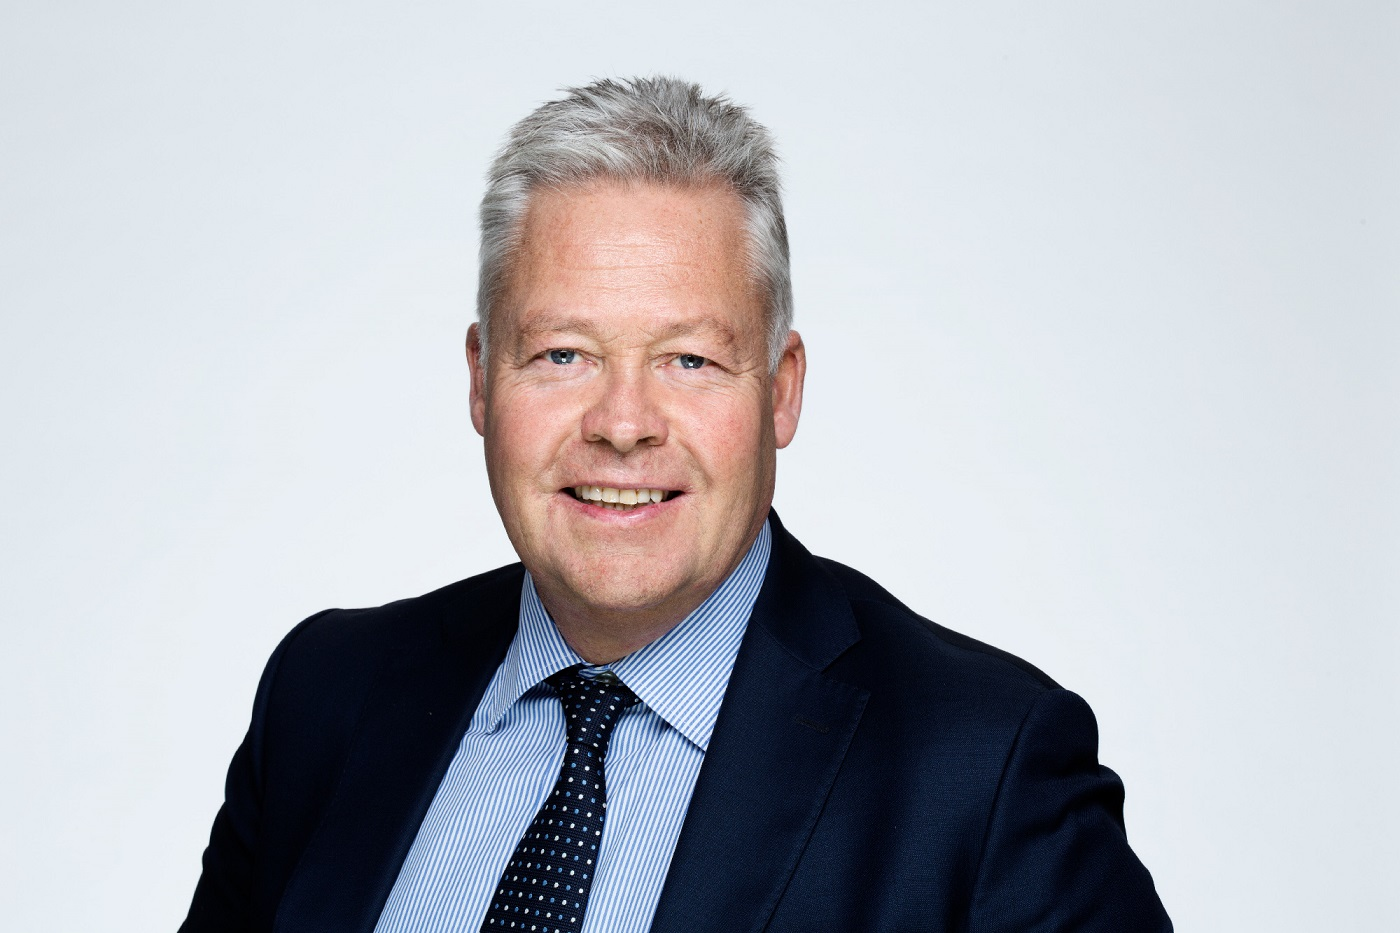 Konsernsjef i Gjensidige Helge Leiro Baastad